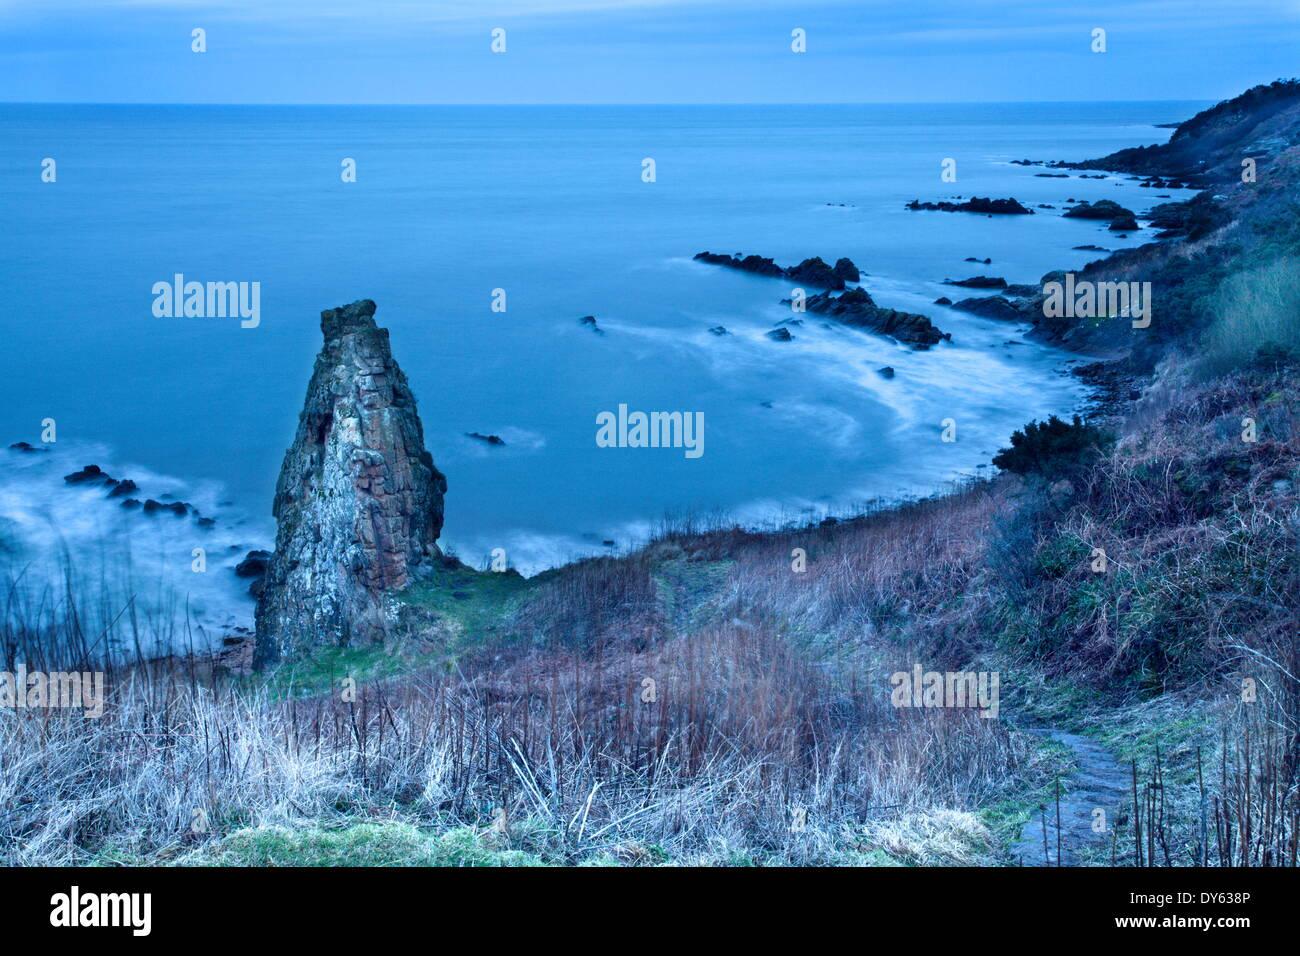 Rock Stack on the Fife Coast near St. Andrews, Fife, Scotland, United Kingdom, Europe - Stock Image